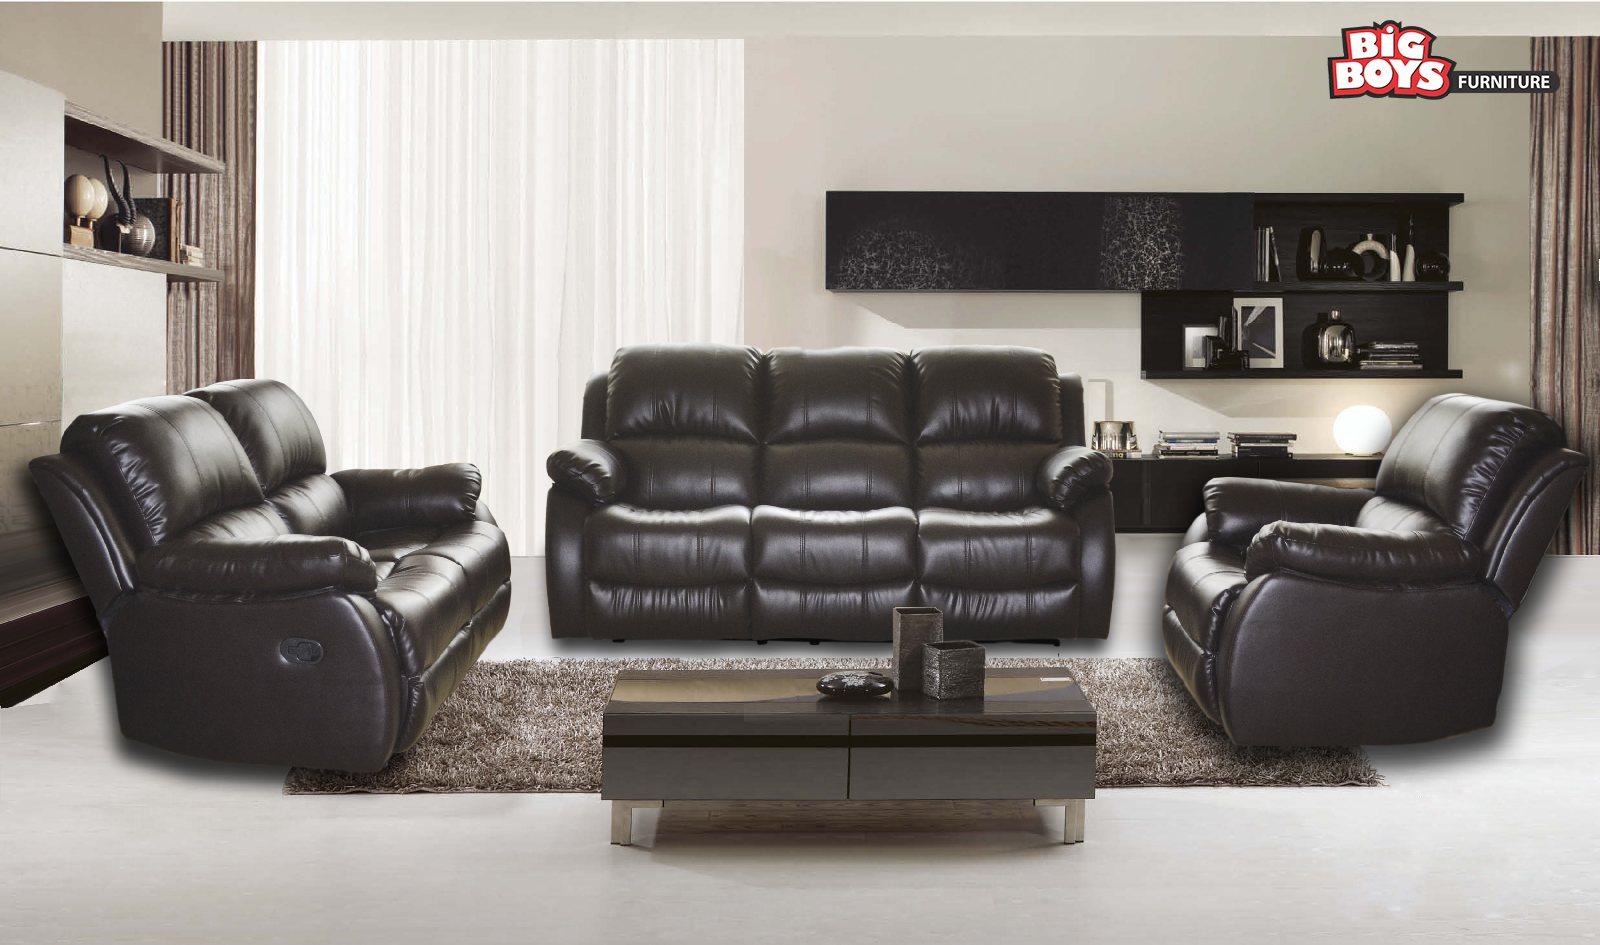 Latest designs of furniture at Big Boys Furniture Delta/Surrey